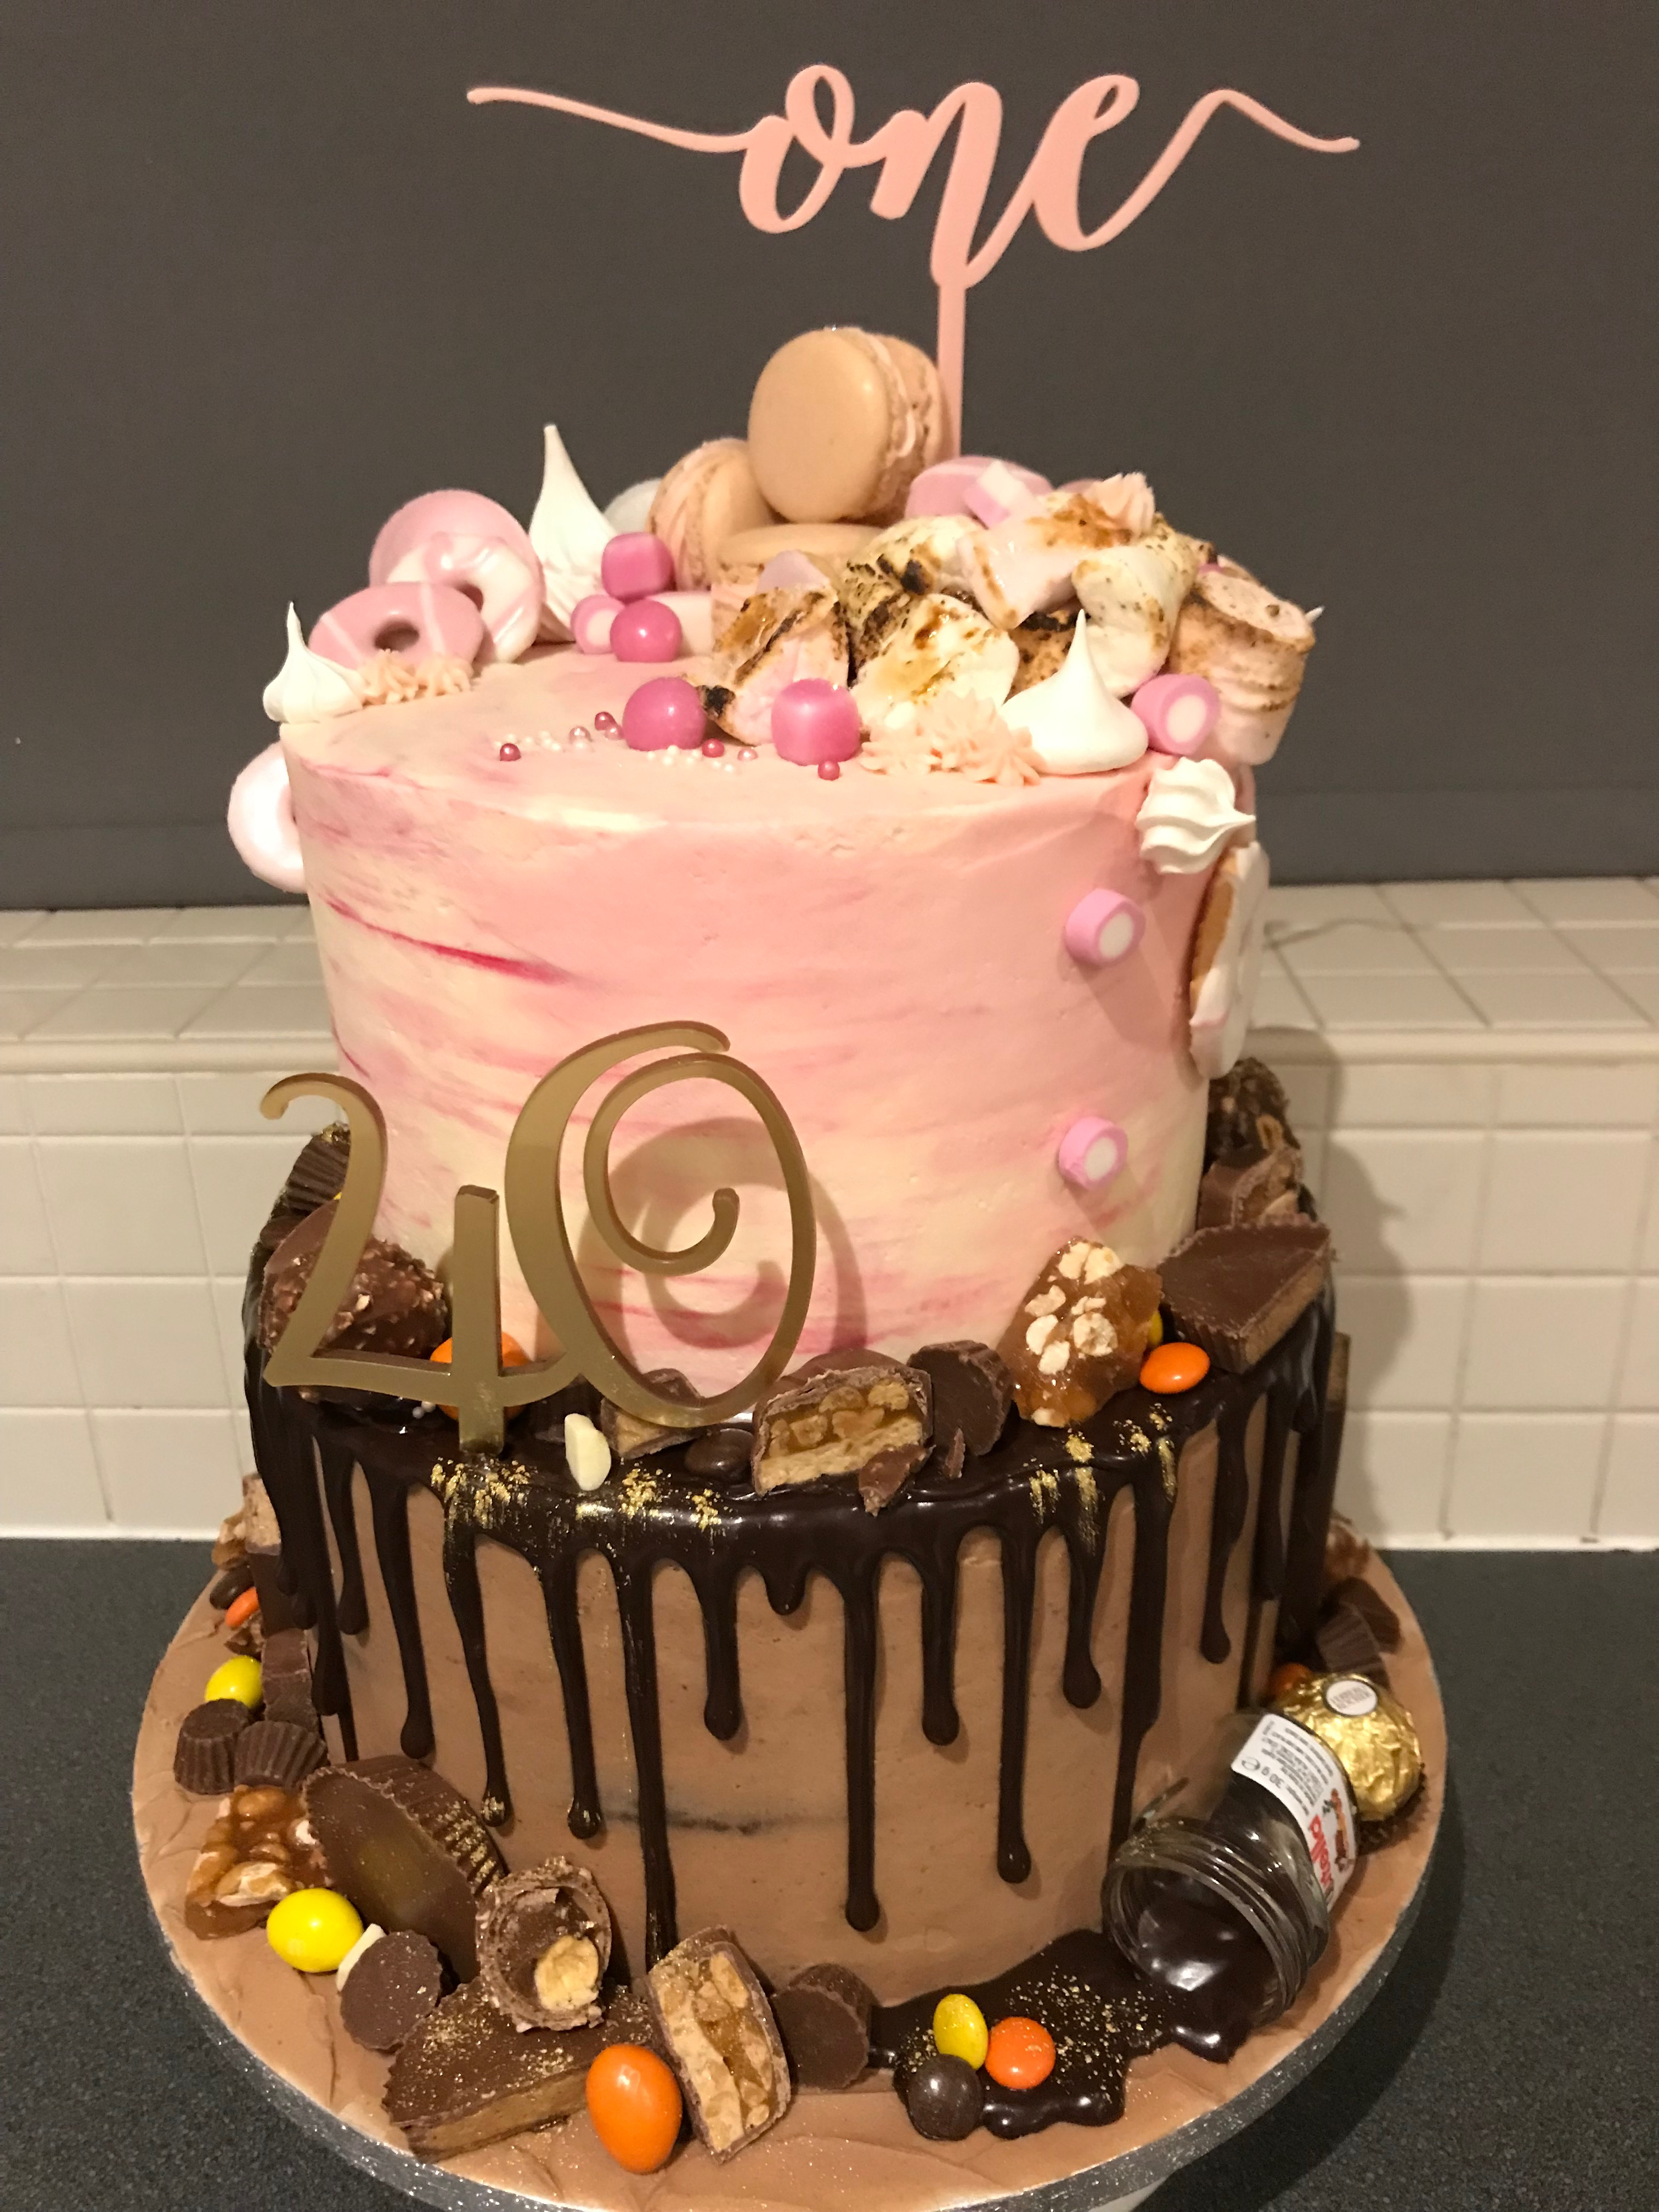 Joint birthday cake